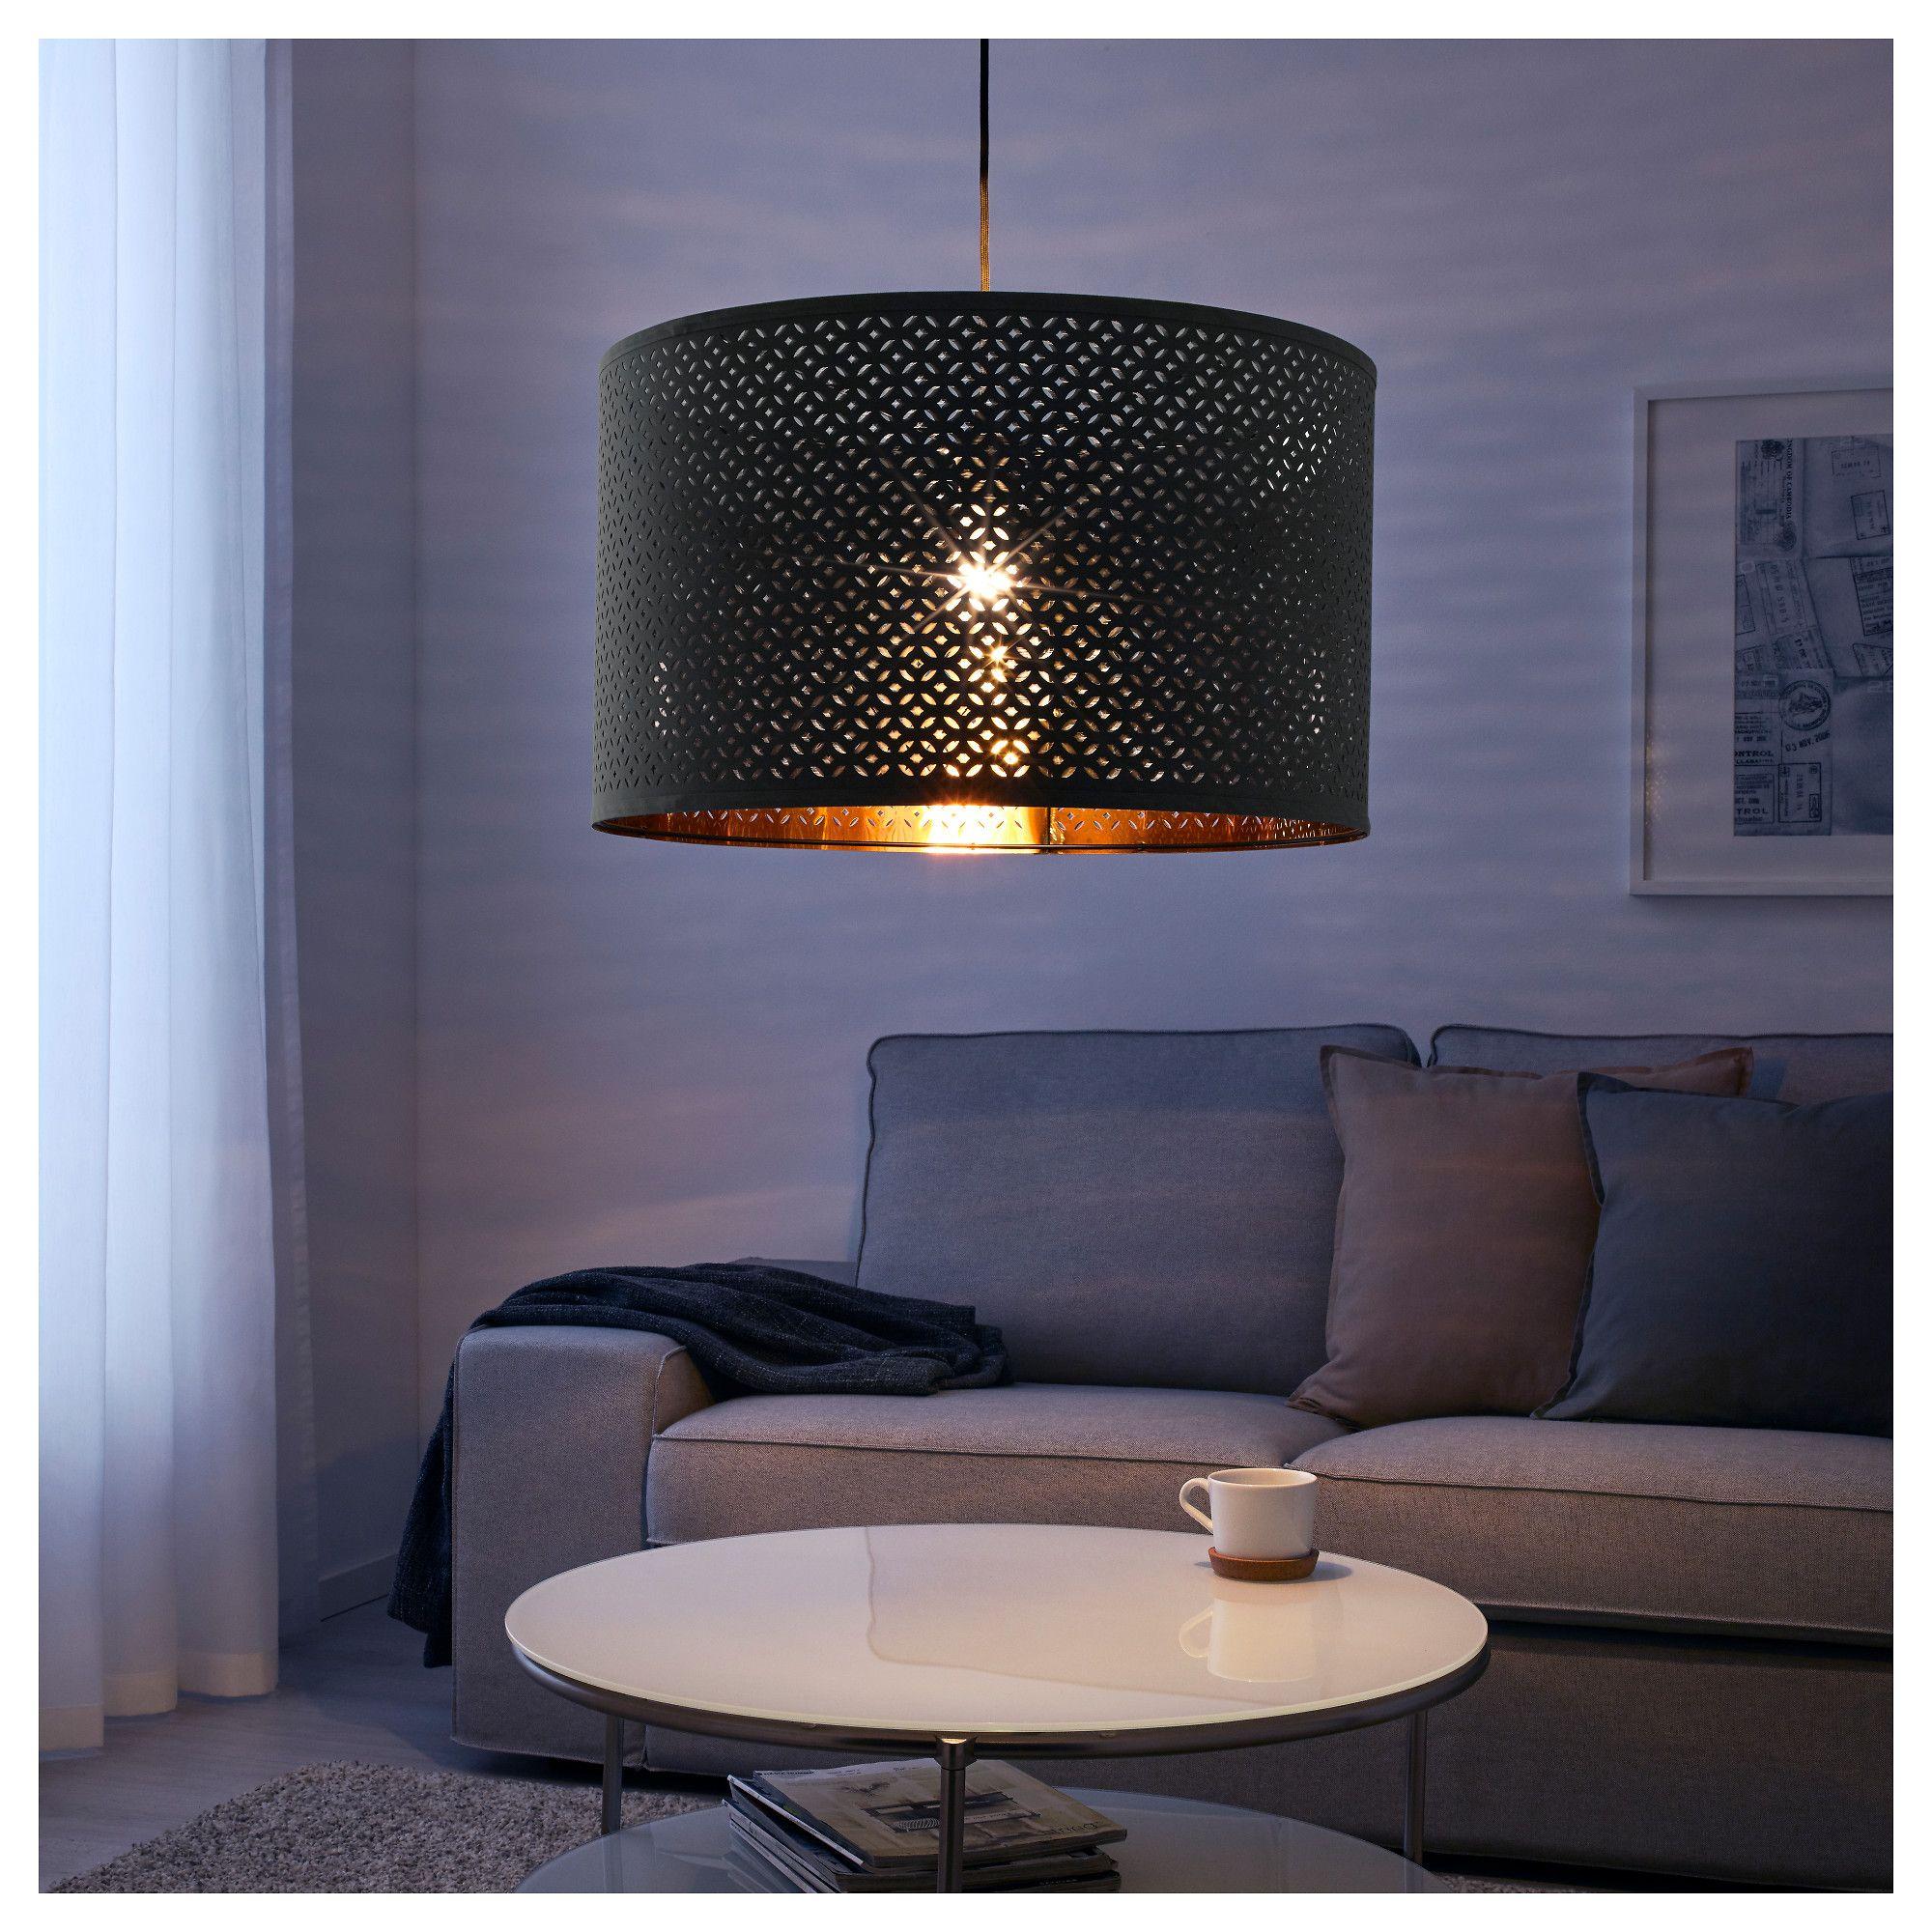 Fresh home furnishing ideas and affordable furniture   Ikea